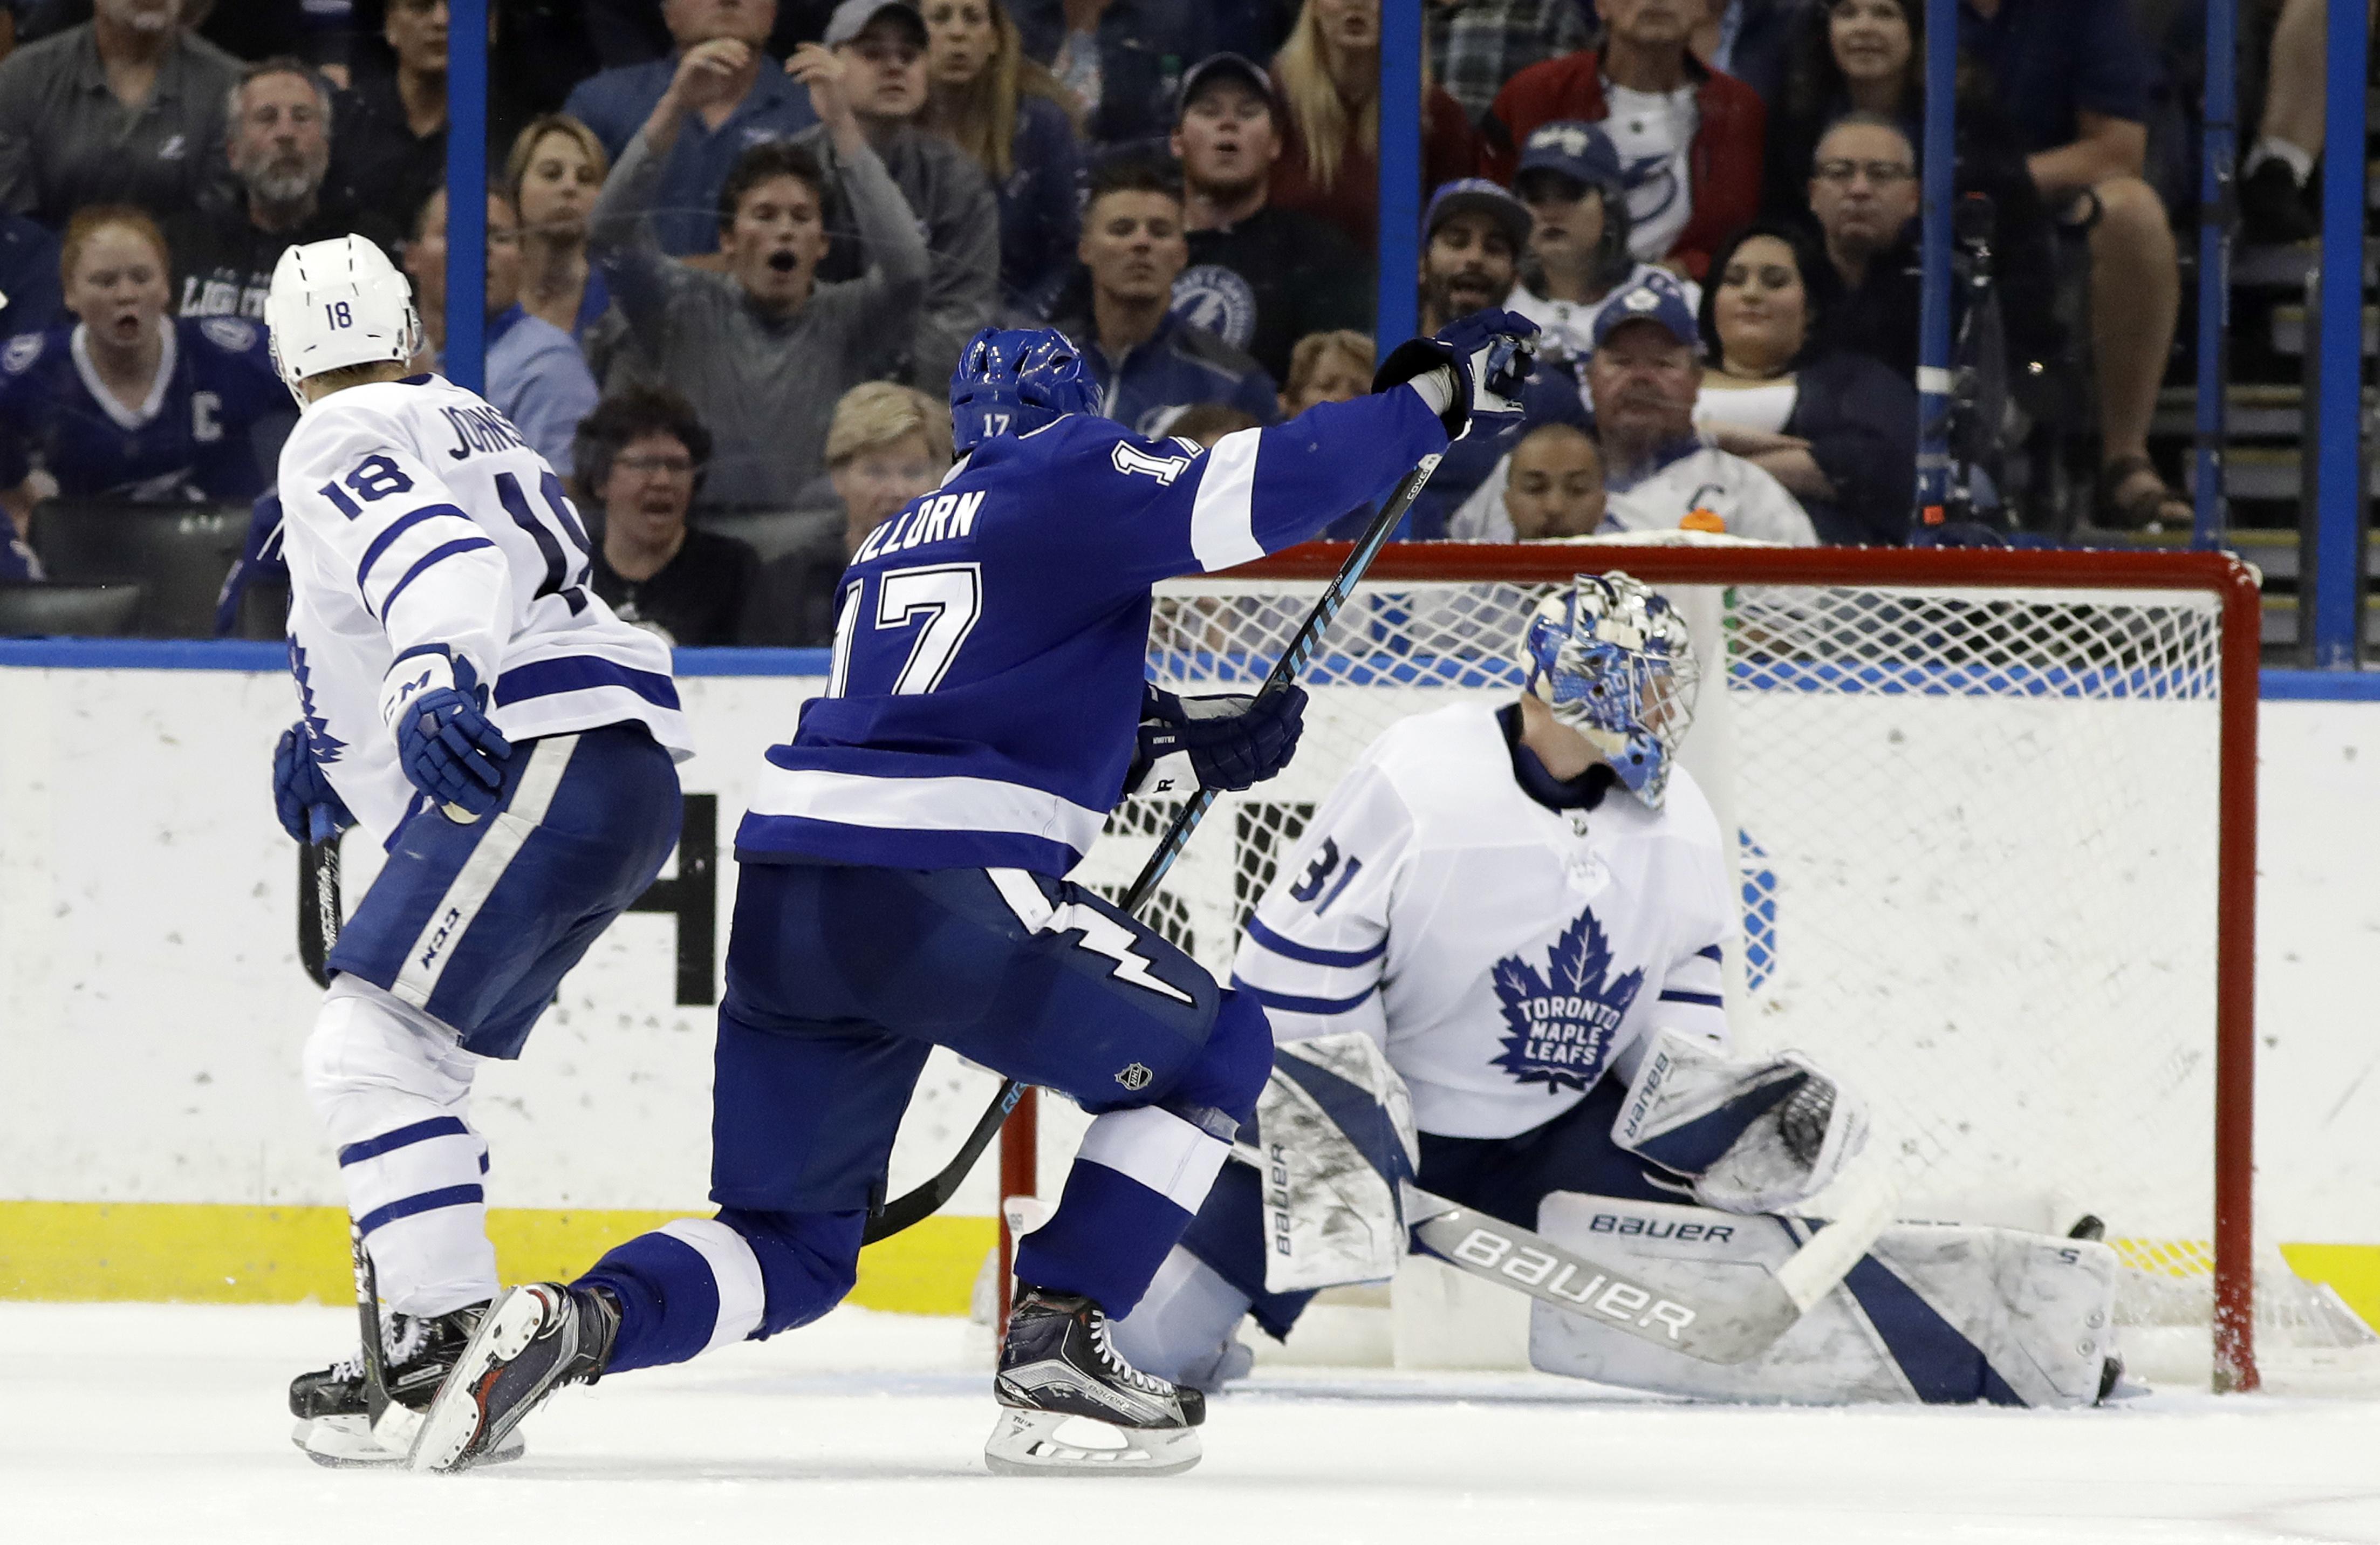 Maple_leafs_lightning_hockey_04887